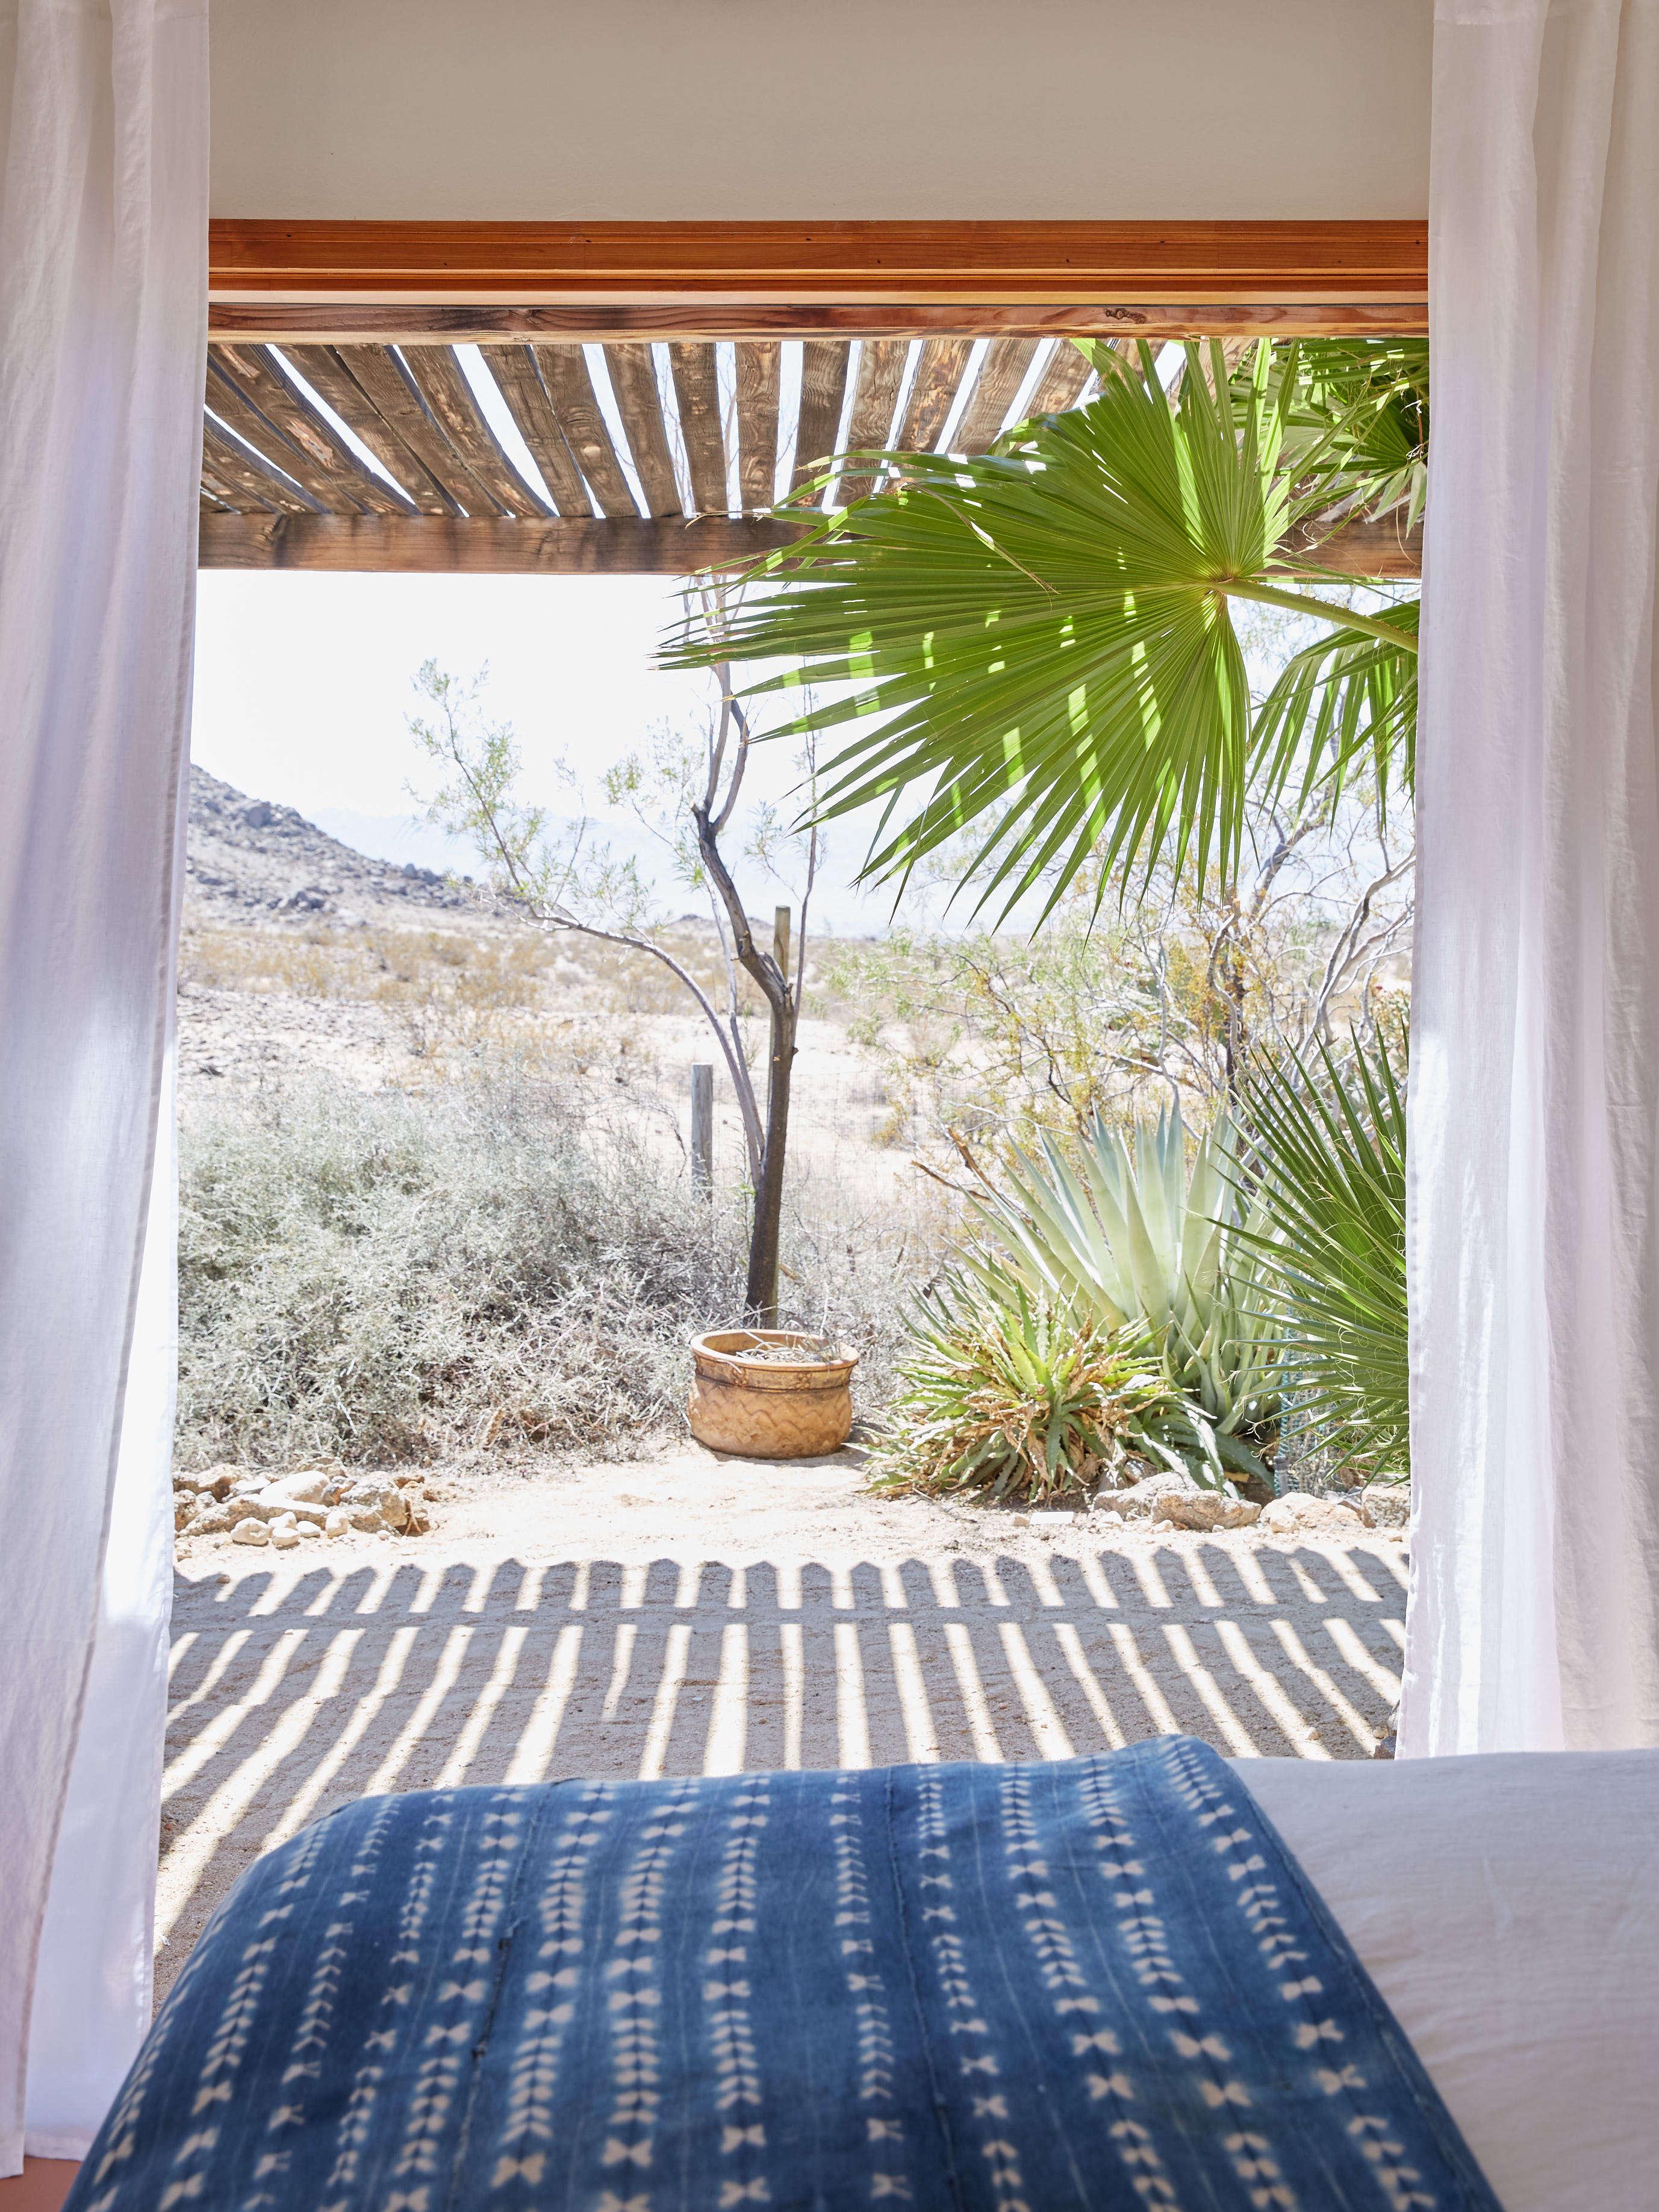 joshua tree casita airbnb desert view, kate sears photo